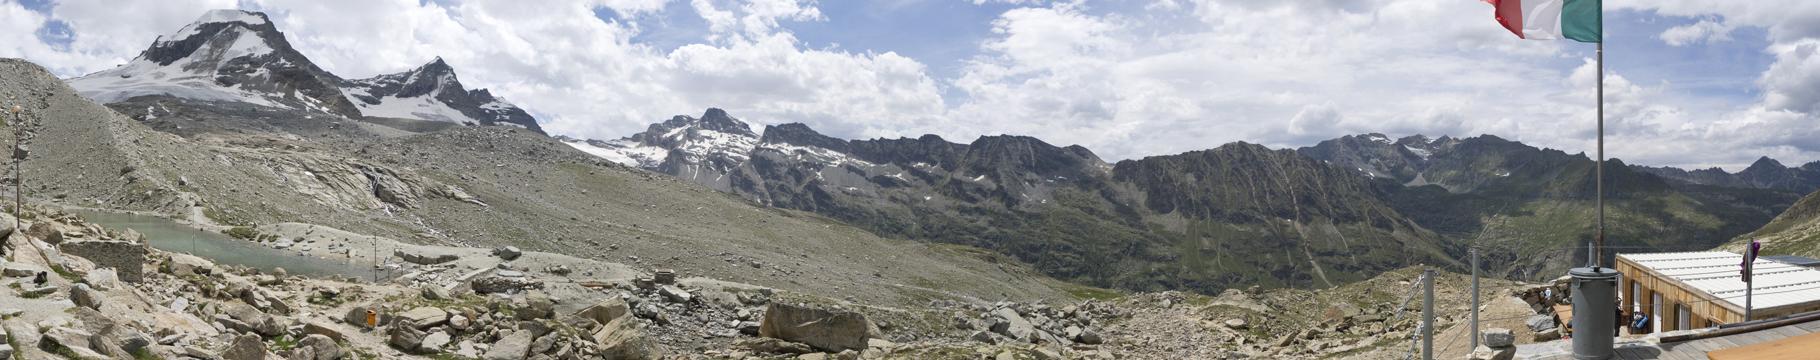 Gran Paradiso & Macizo del Mont Blanc | Ibero Trek